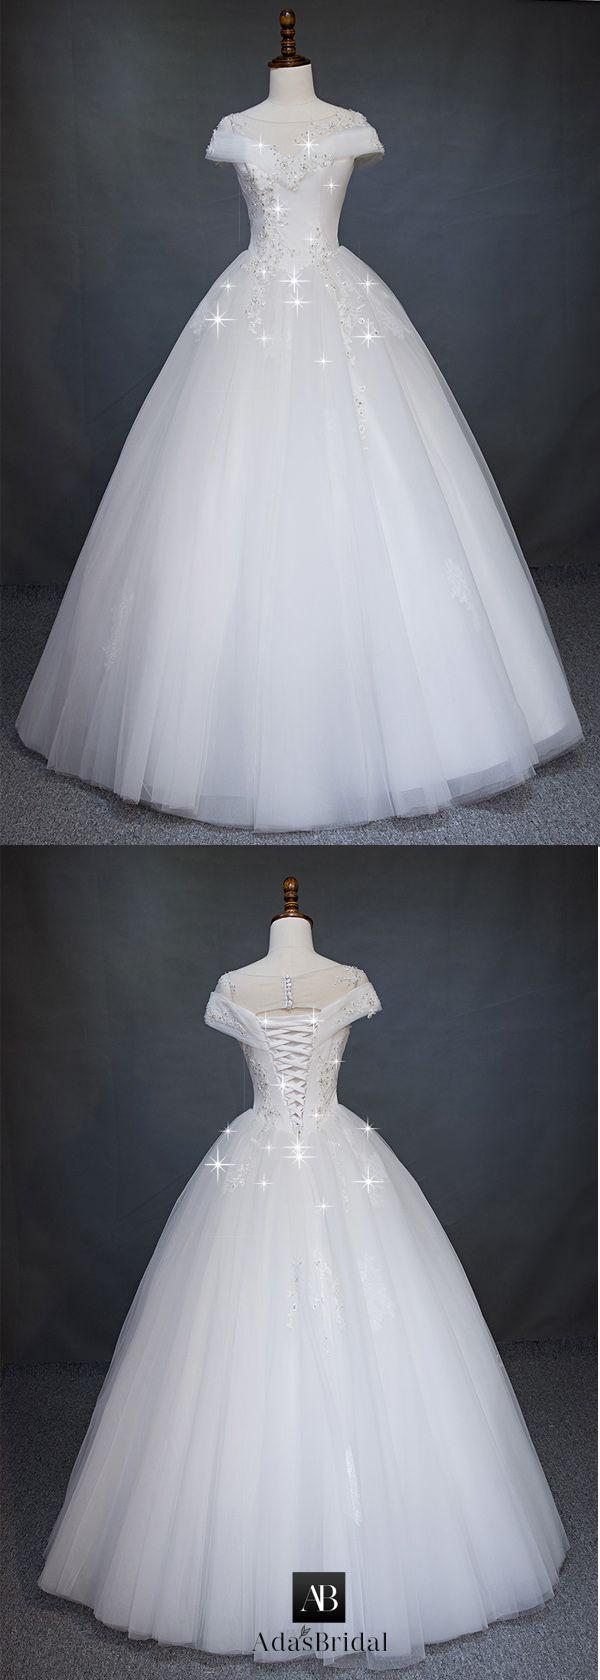 Modest tulle u satin bateau neckline ball gown wedding dress with